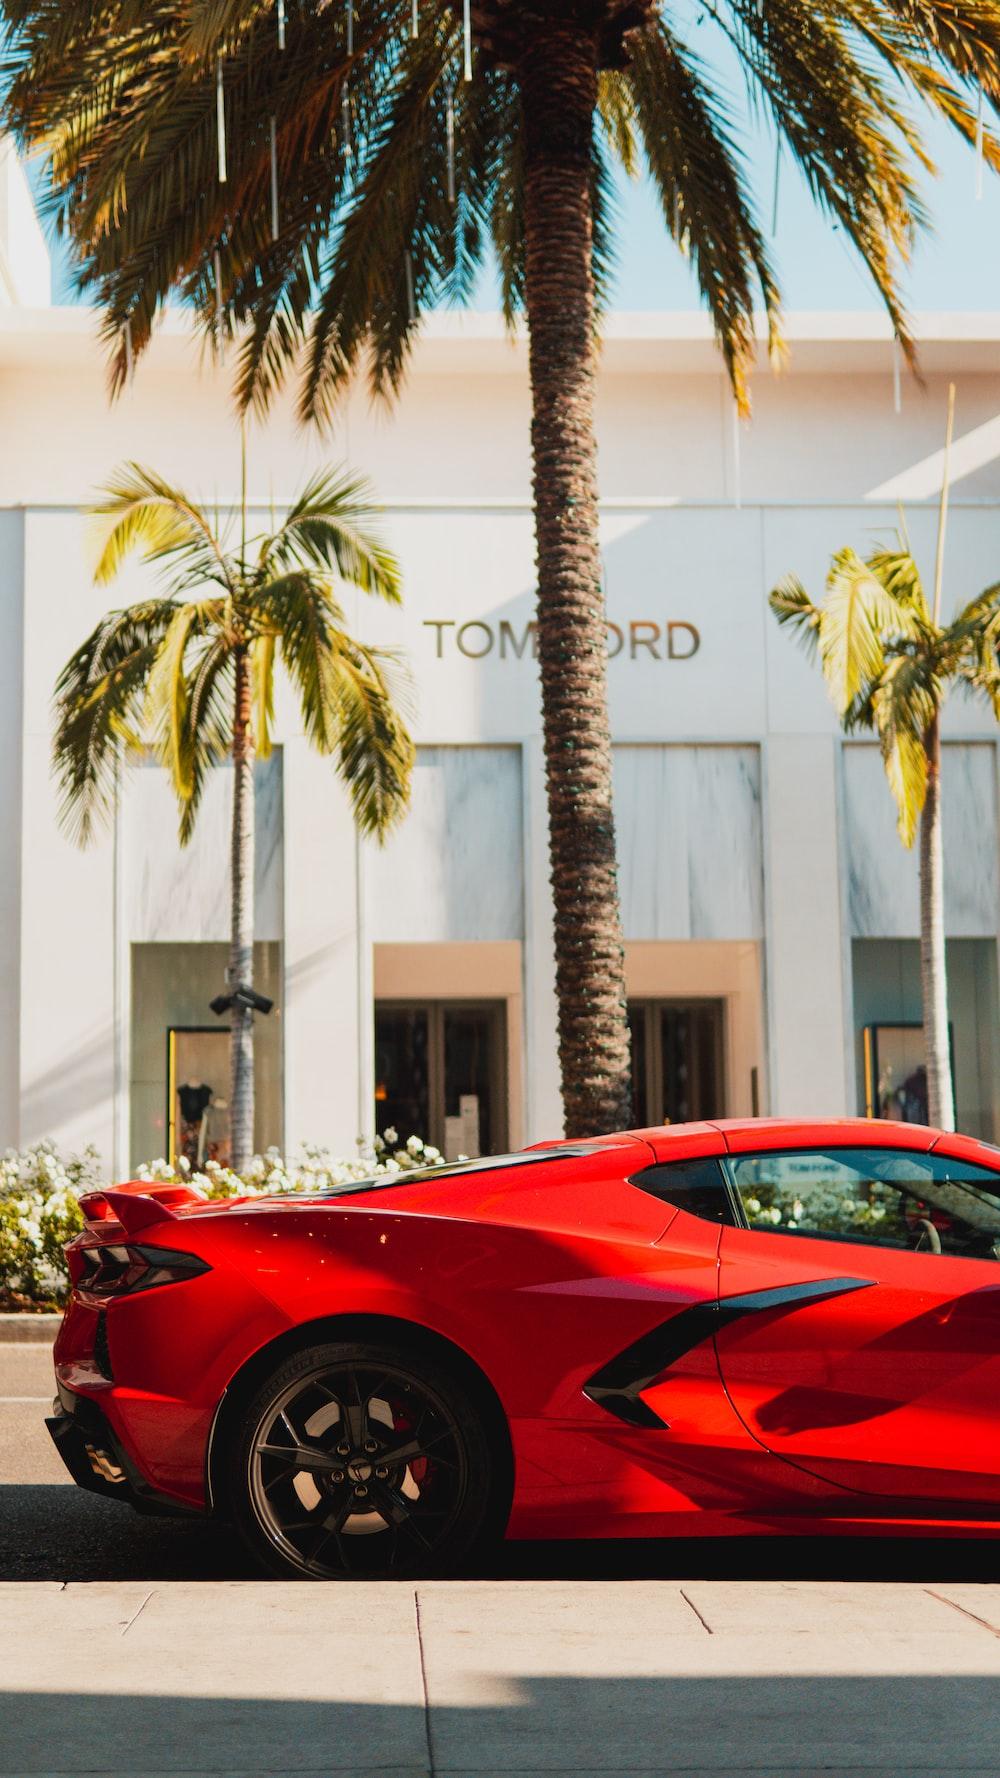 red ferrari 458 italia parked near palm tree